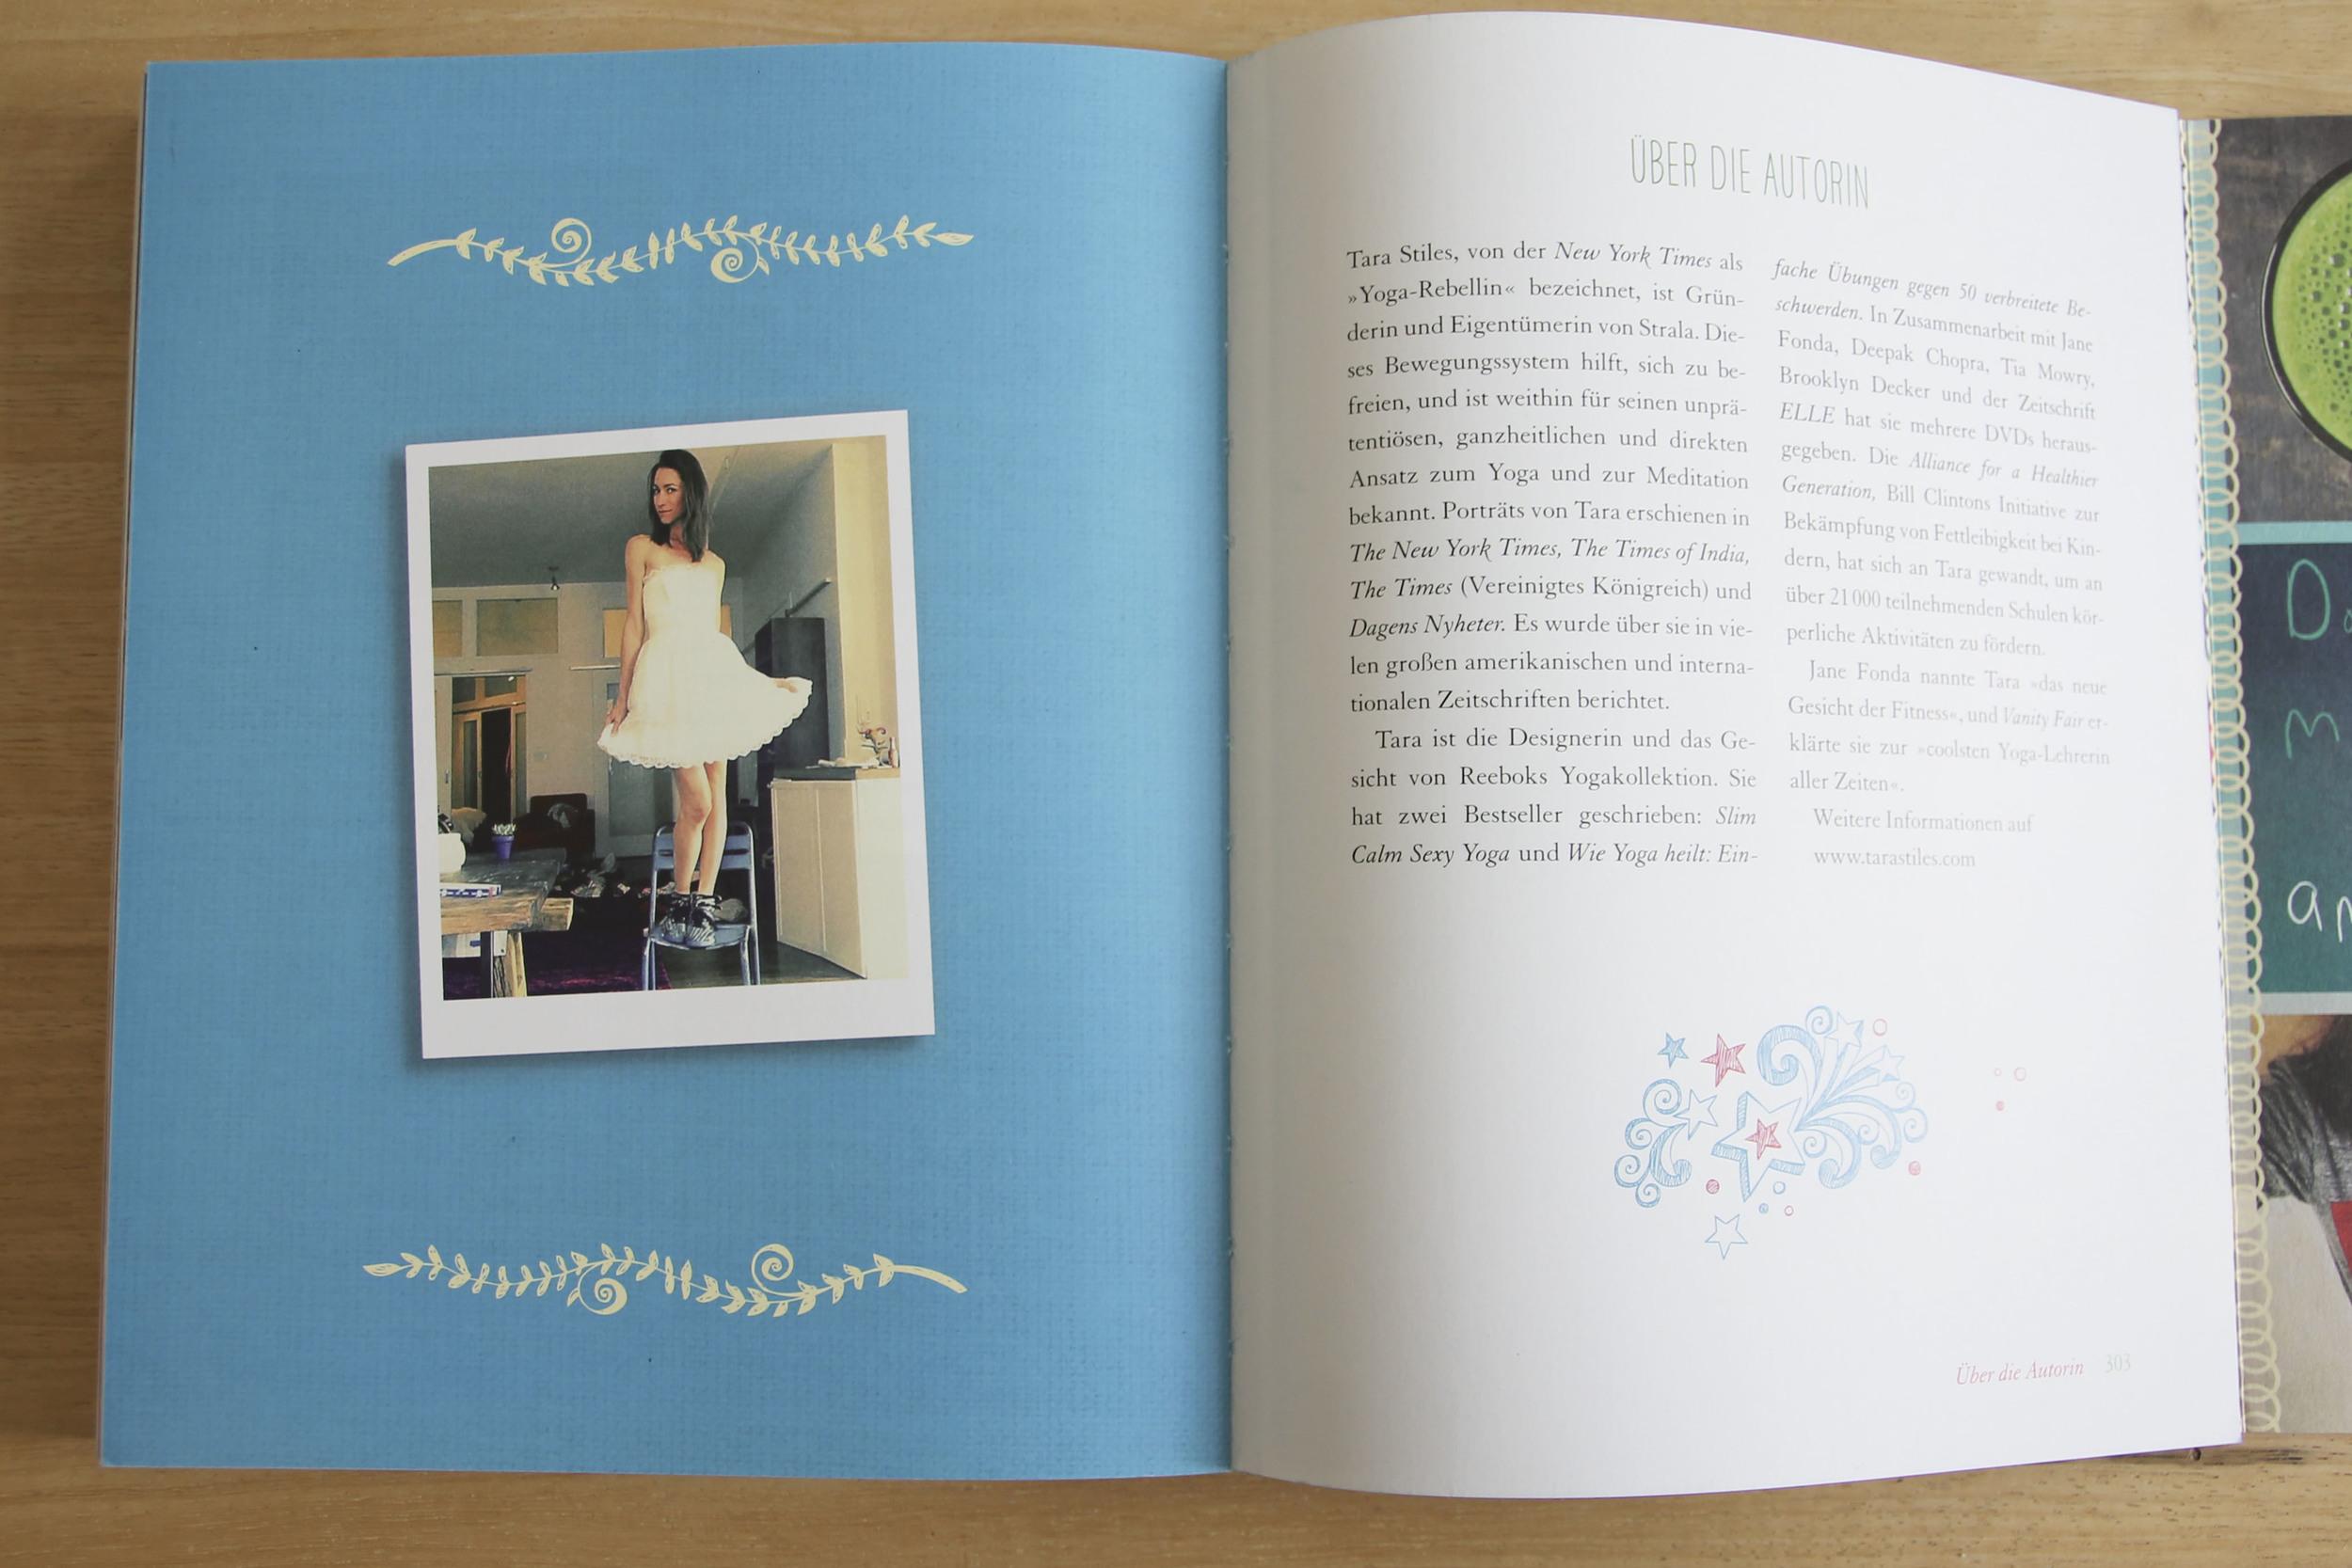 Tara Stiles, dein Yoga dein Leben, Rezeptbuch, Yoga Buch, Ratgeber3241.jpg